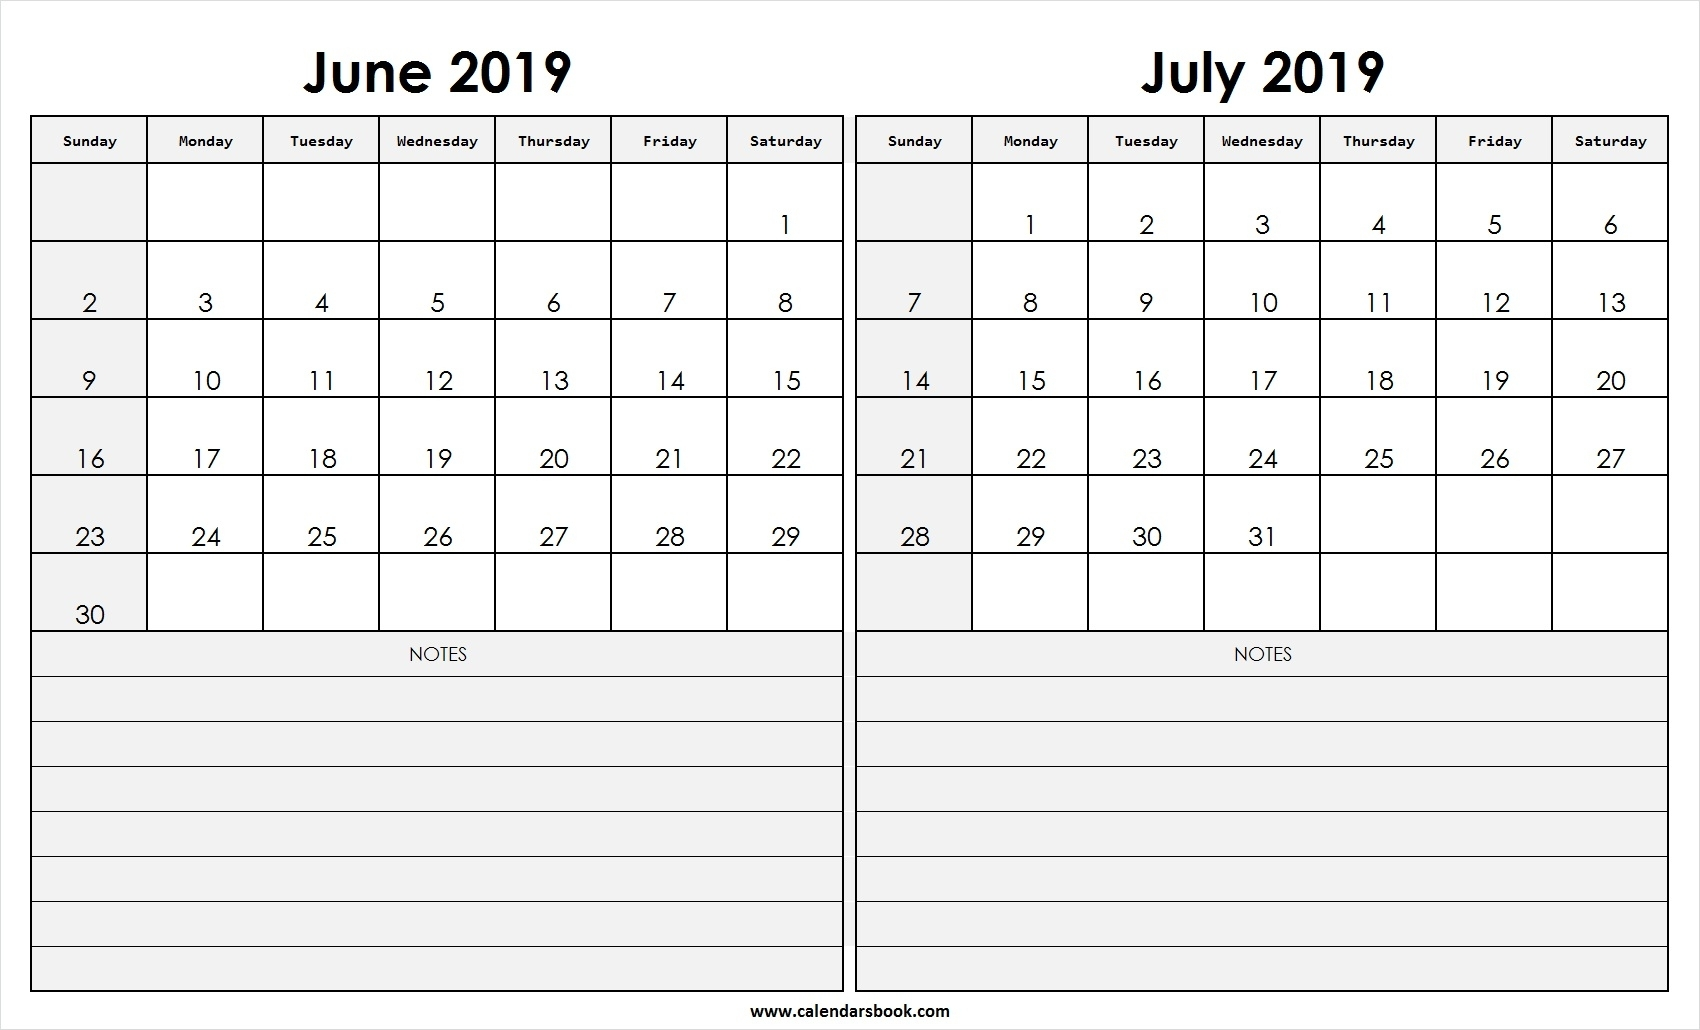 Print June July 2019 Calendar Template | 2 Month Calendar regarding 2 Month Calendar Template June July